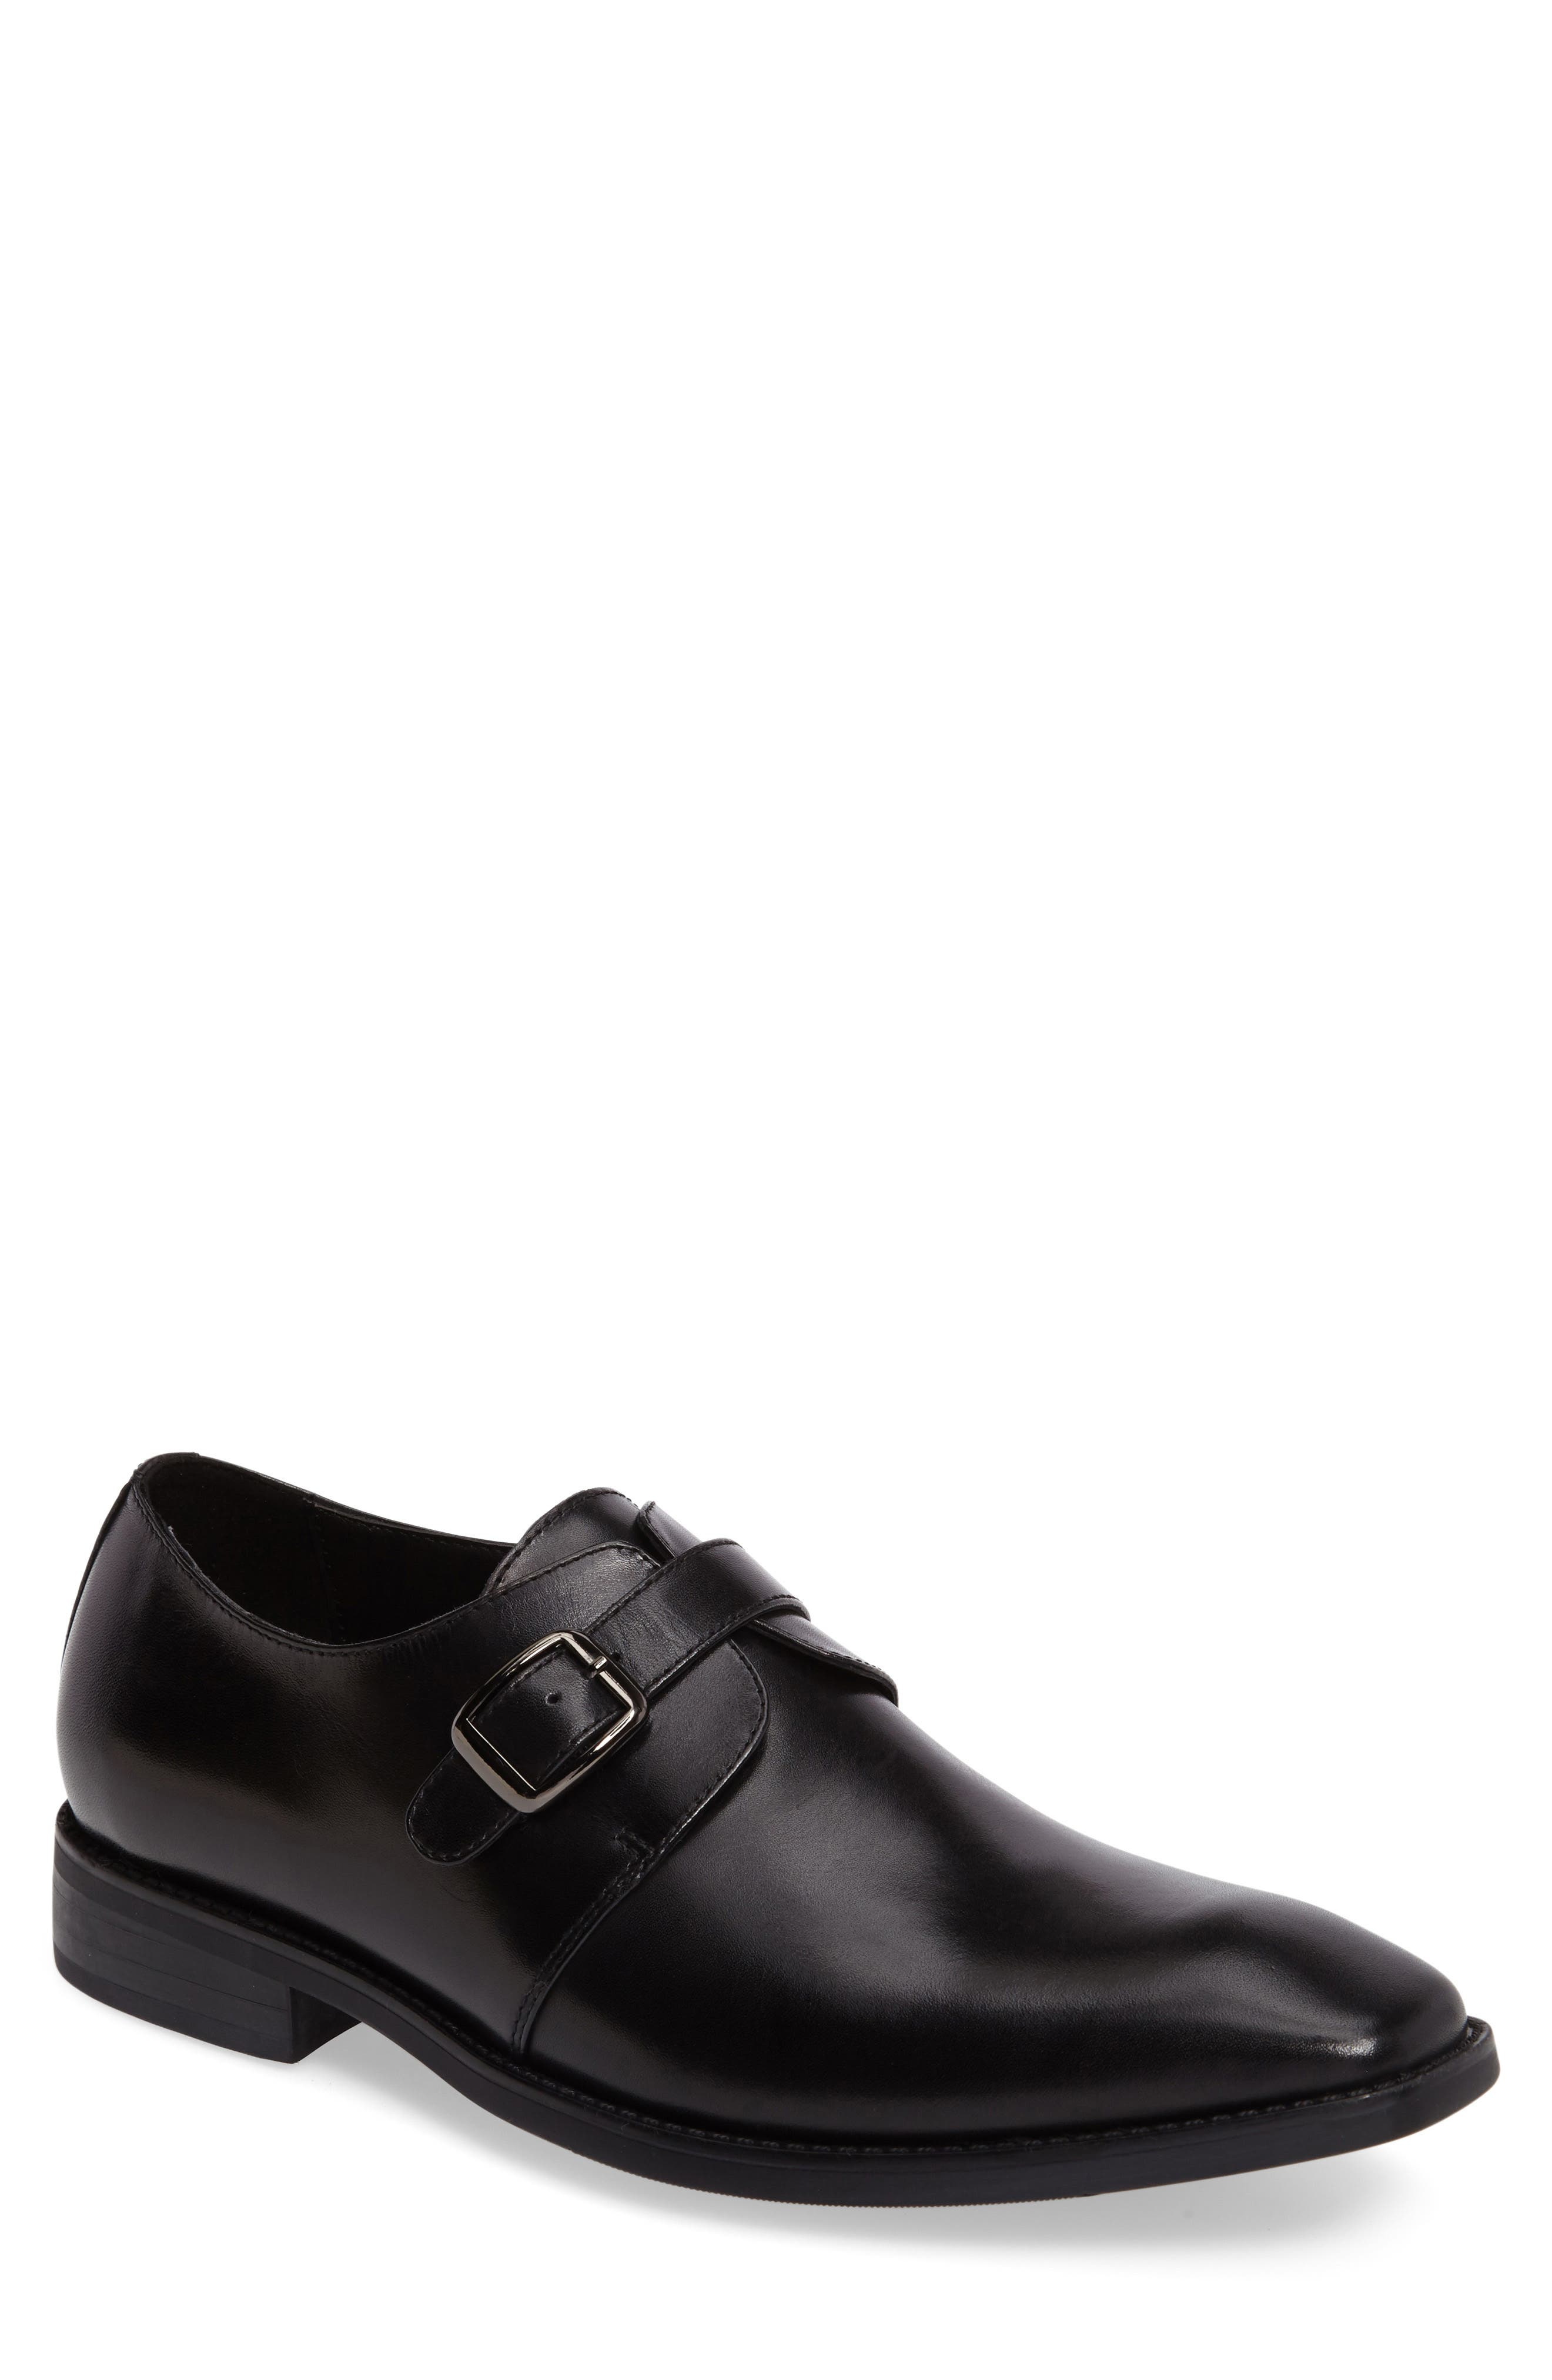 Landon Monk Strap Shoe,                             Main thumbnail 1, color,                             001